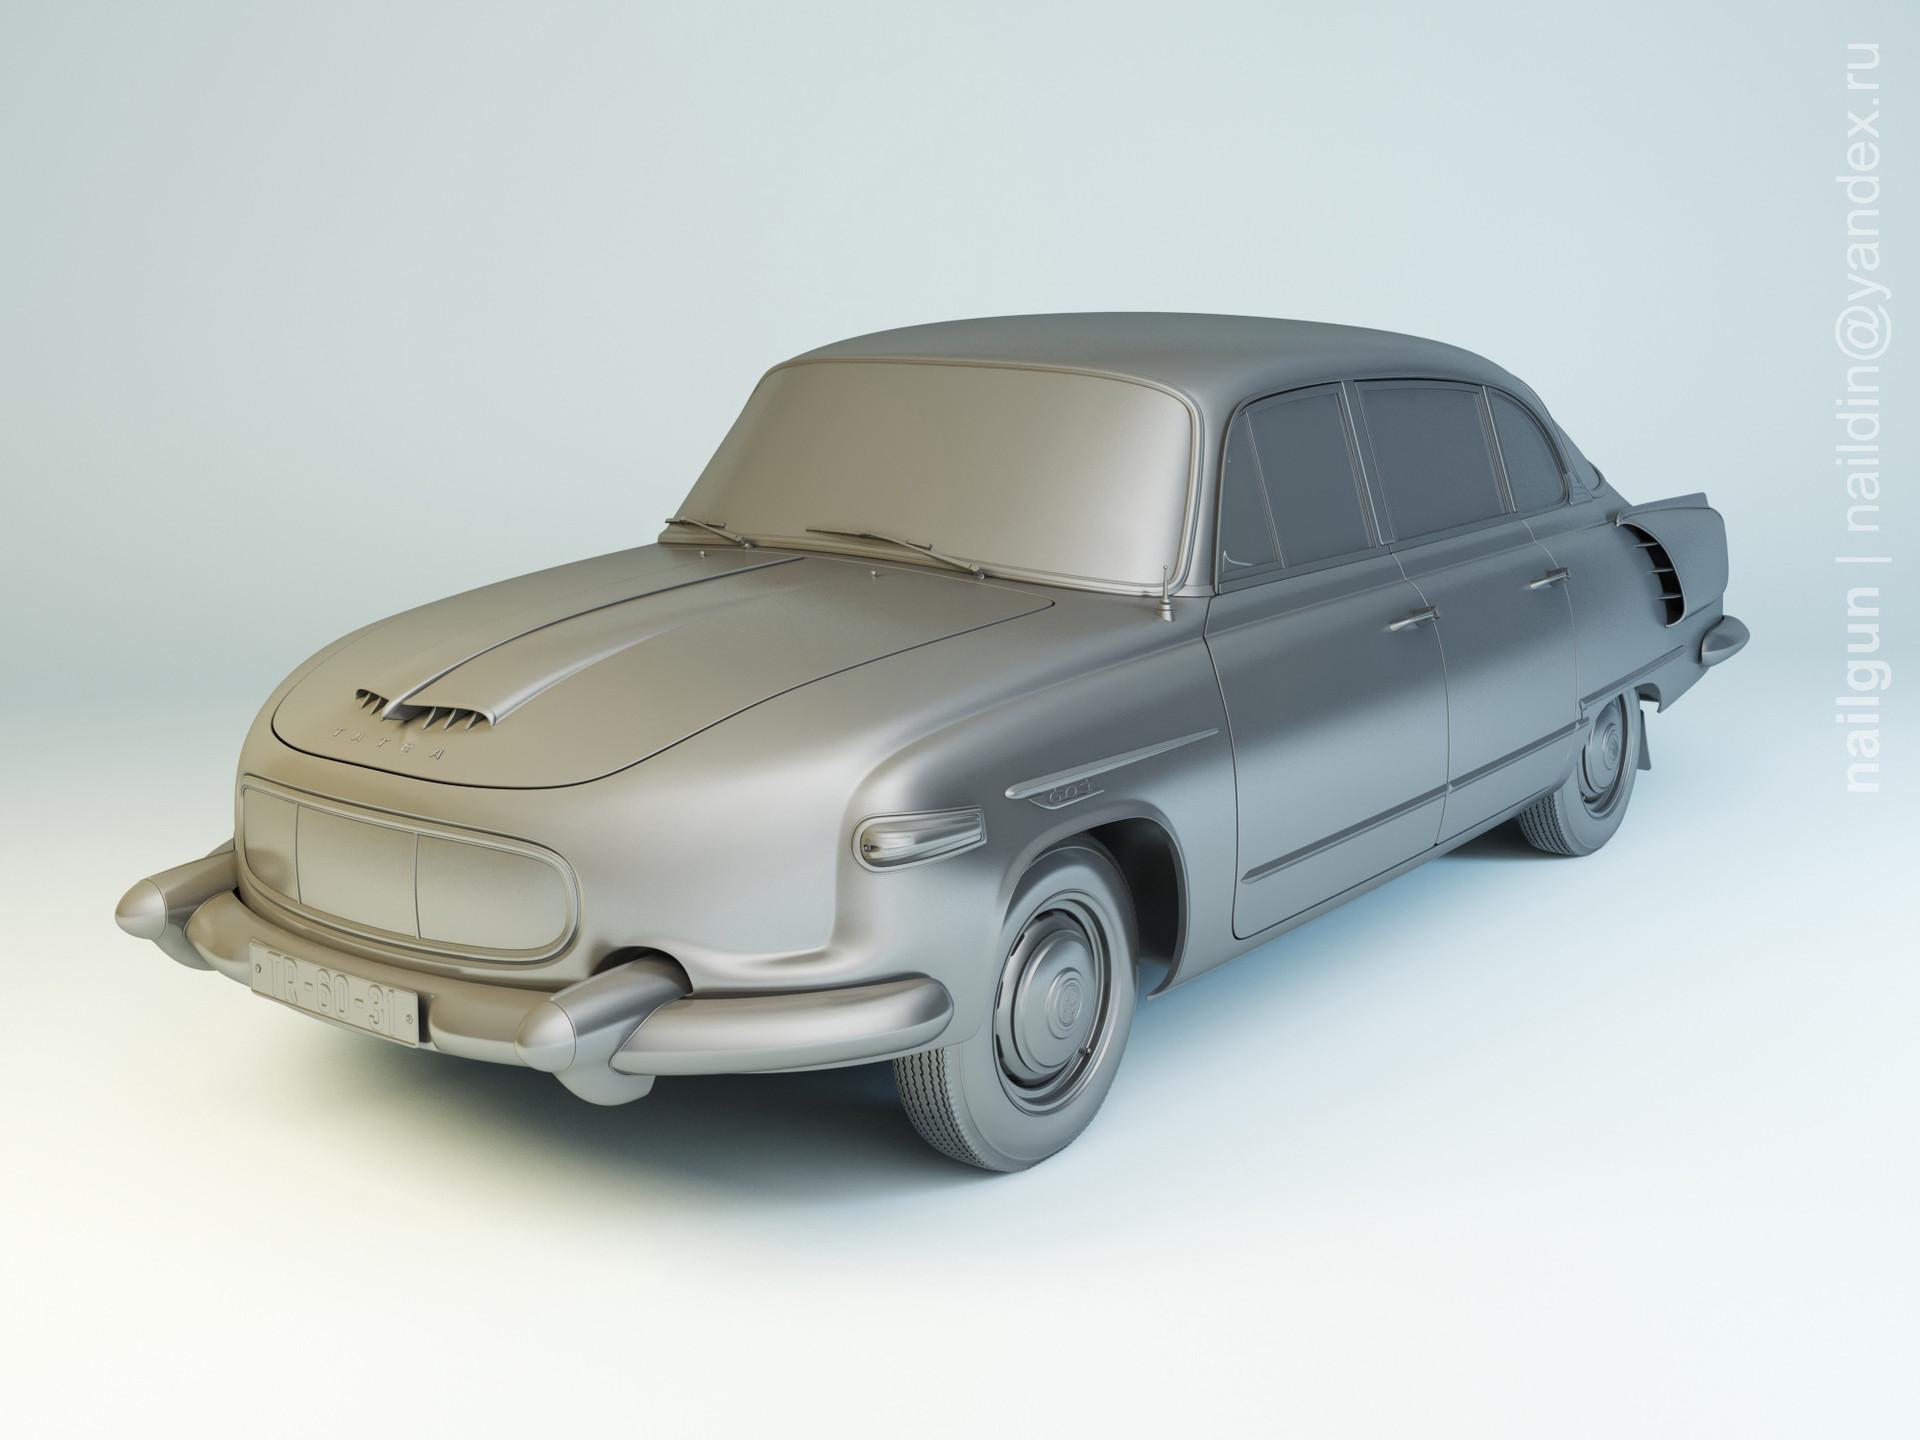 Nail khusnutdinov als 155 002 tatra 603 1 modelling 0